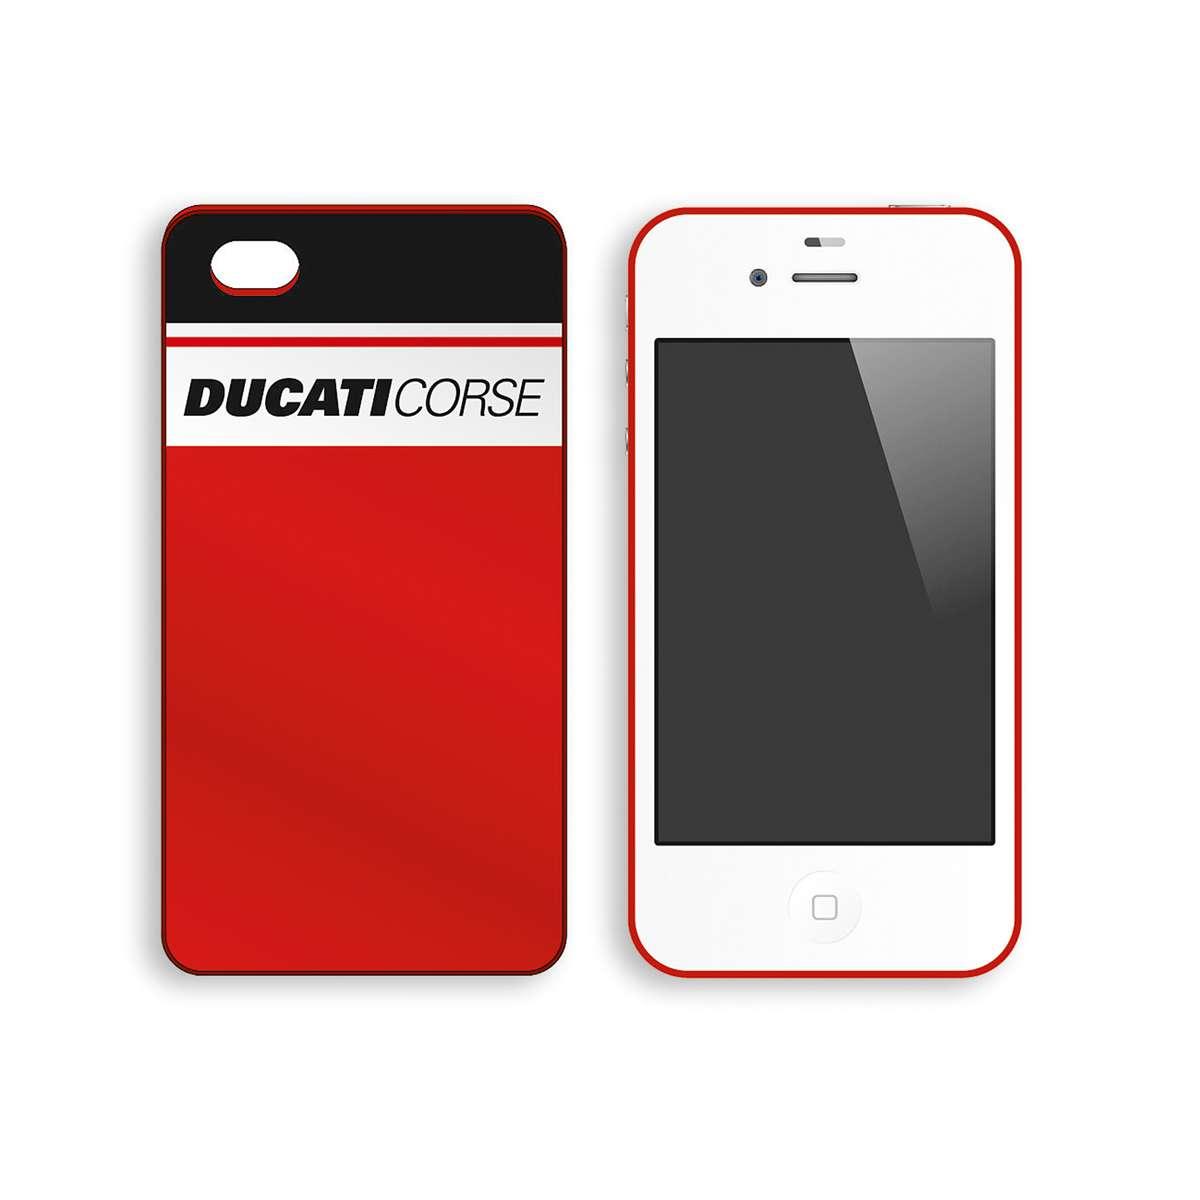 ducati corse handy cover smartphone schutzh lle apple. Black Bedroom Furniture Sets. Home Design Ideas